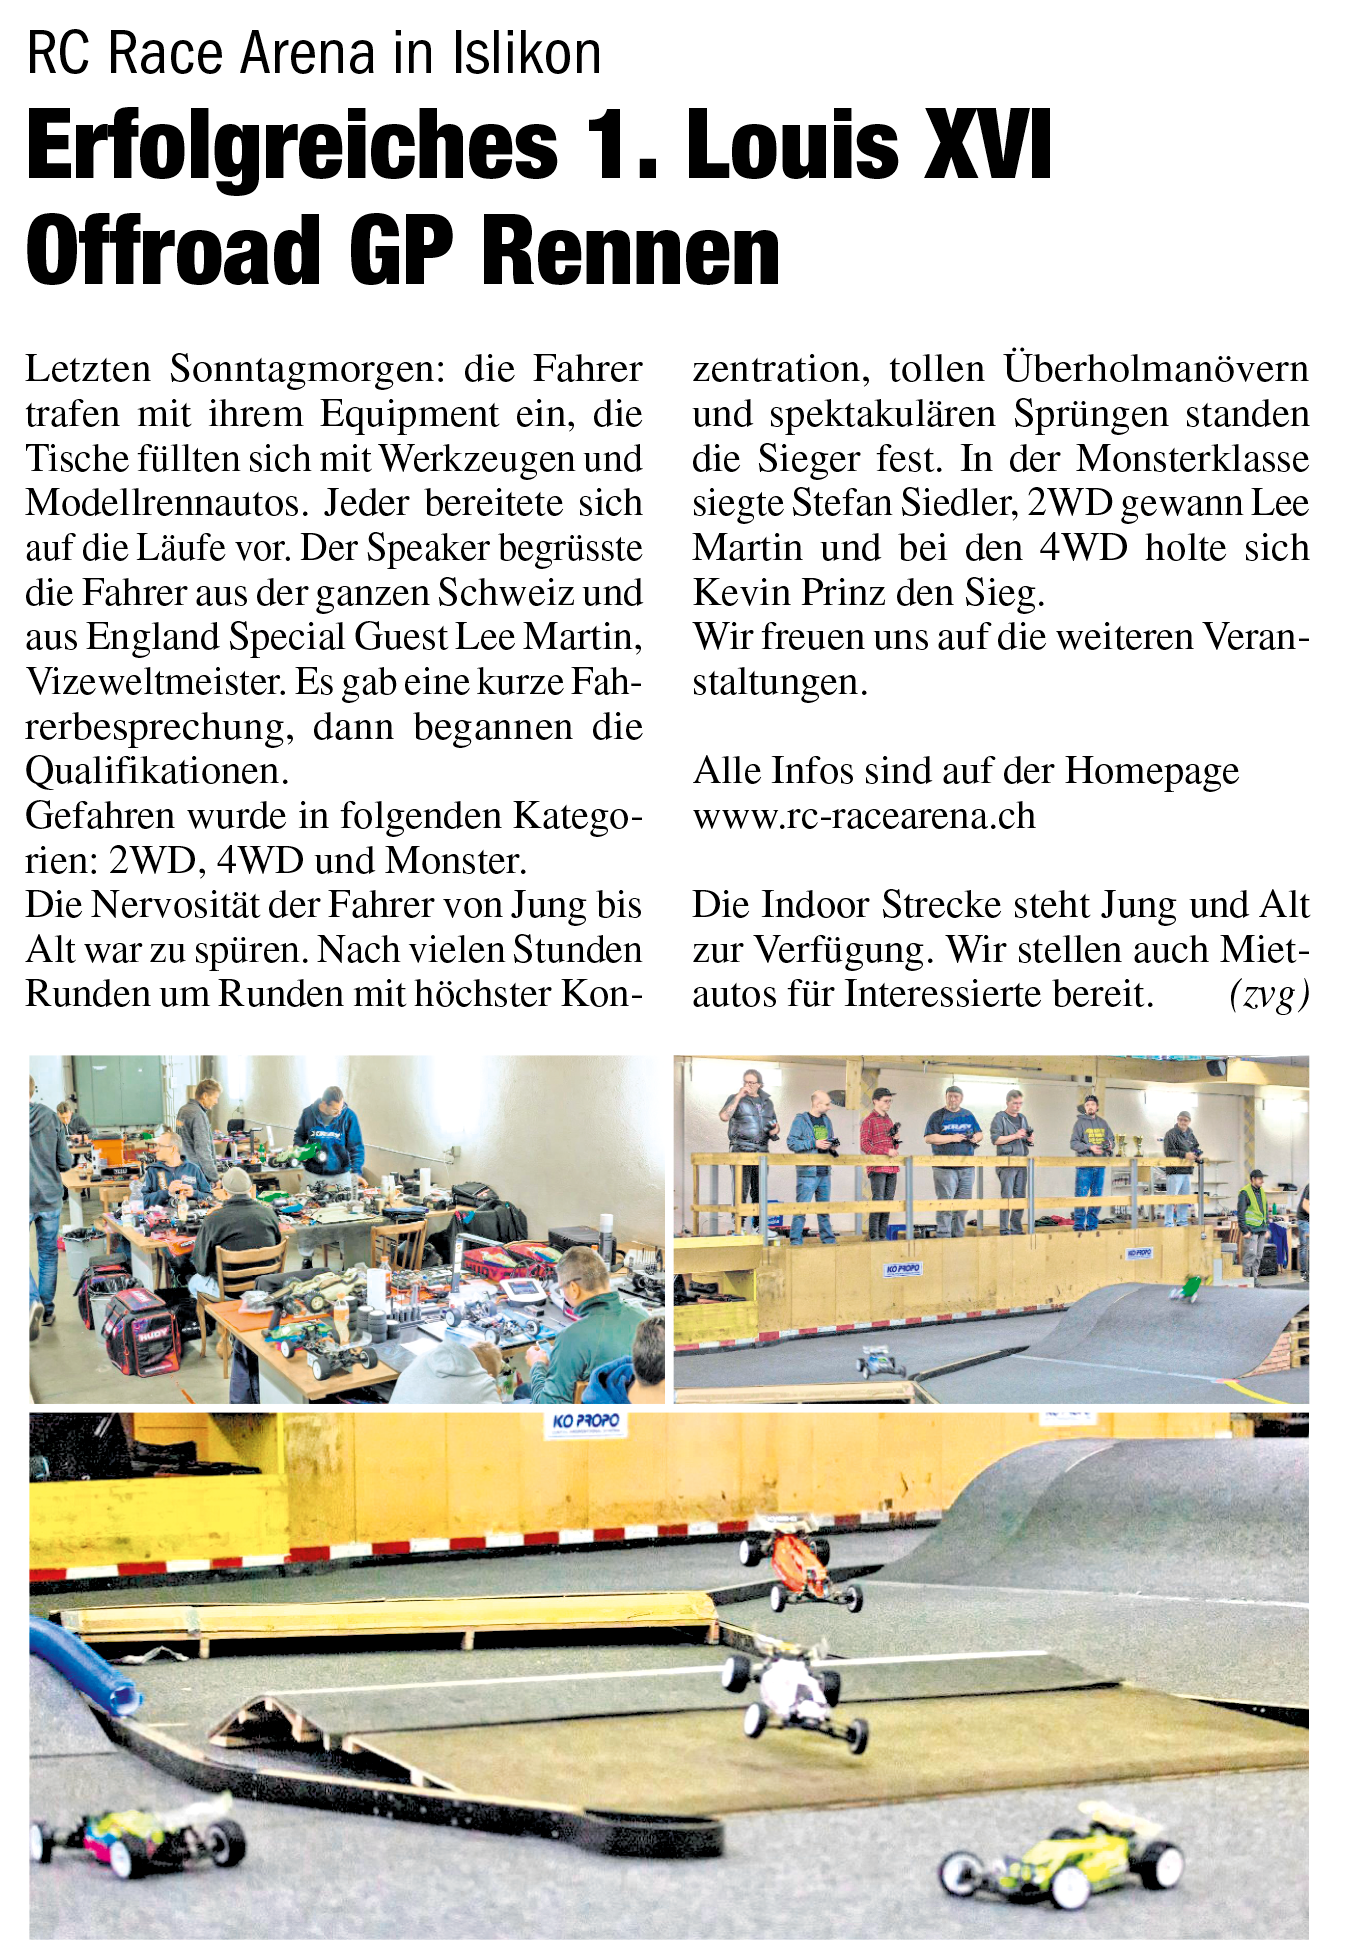 1. LOUIS XVI Offroad GP Islikon